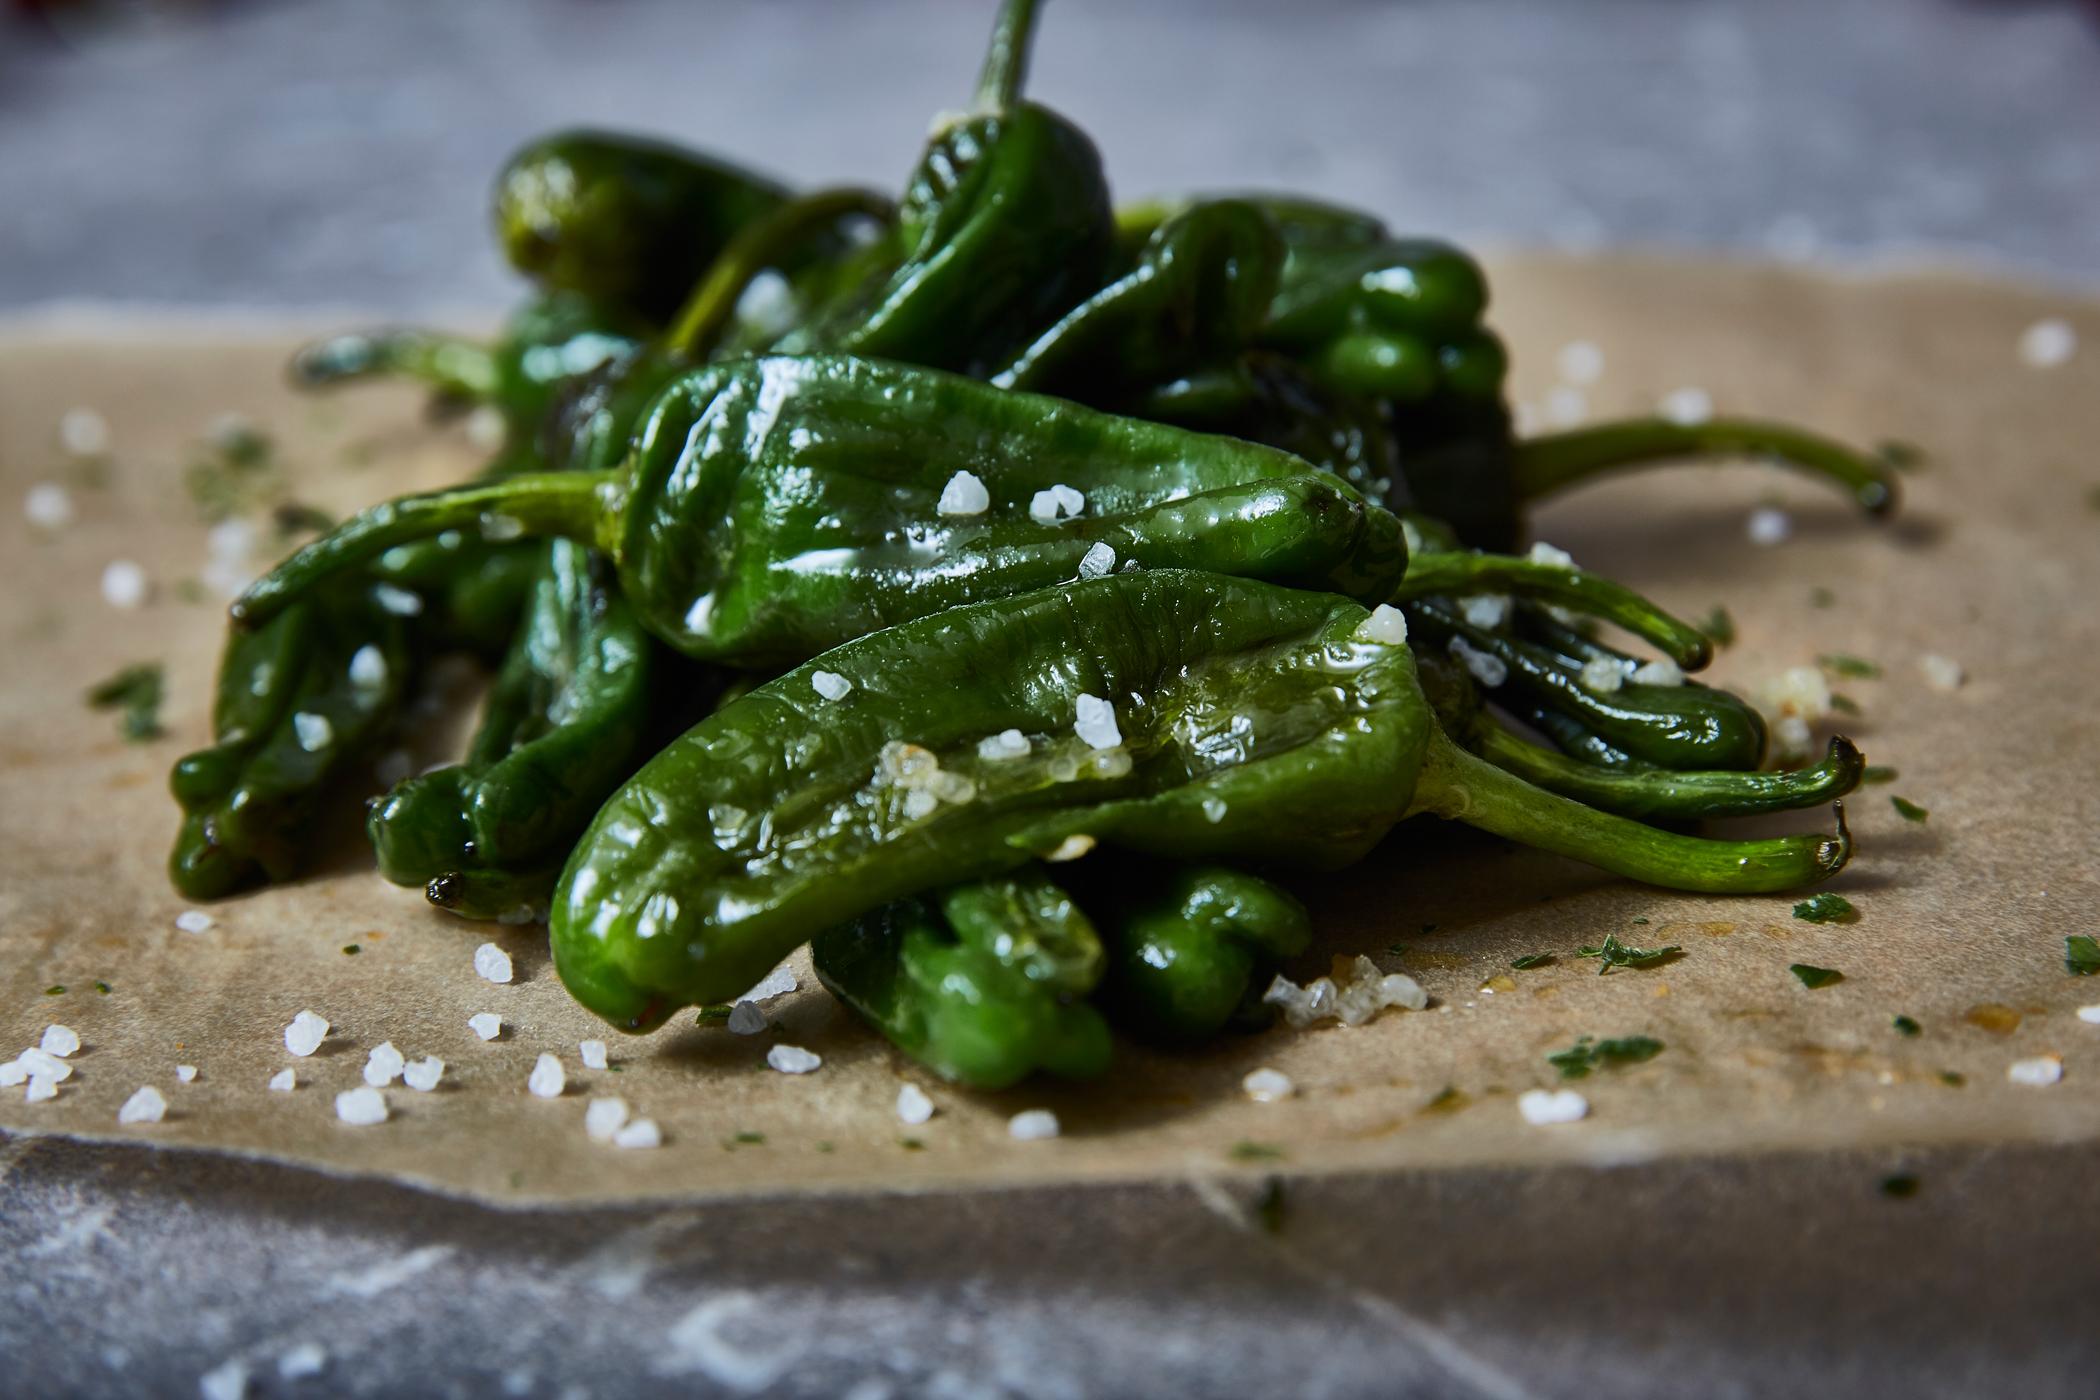 gebratene-Mini-paprika-Megabambi-Food-Blogger-Caterina--Pogorzelski-rezepte